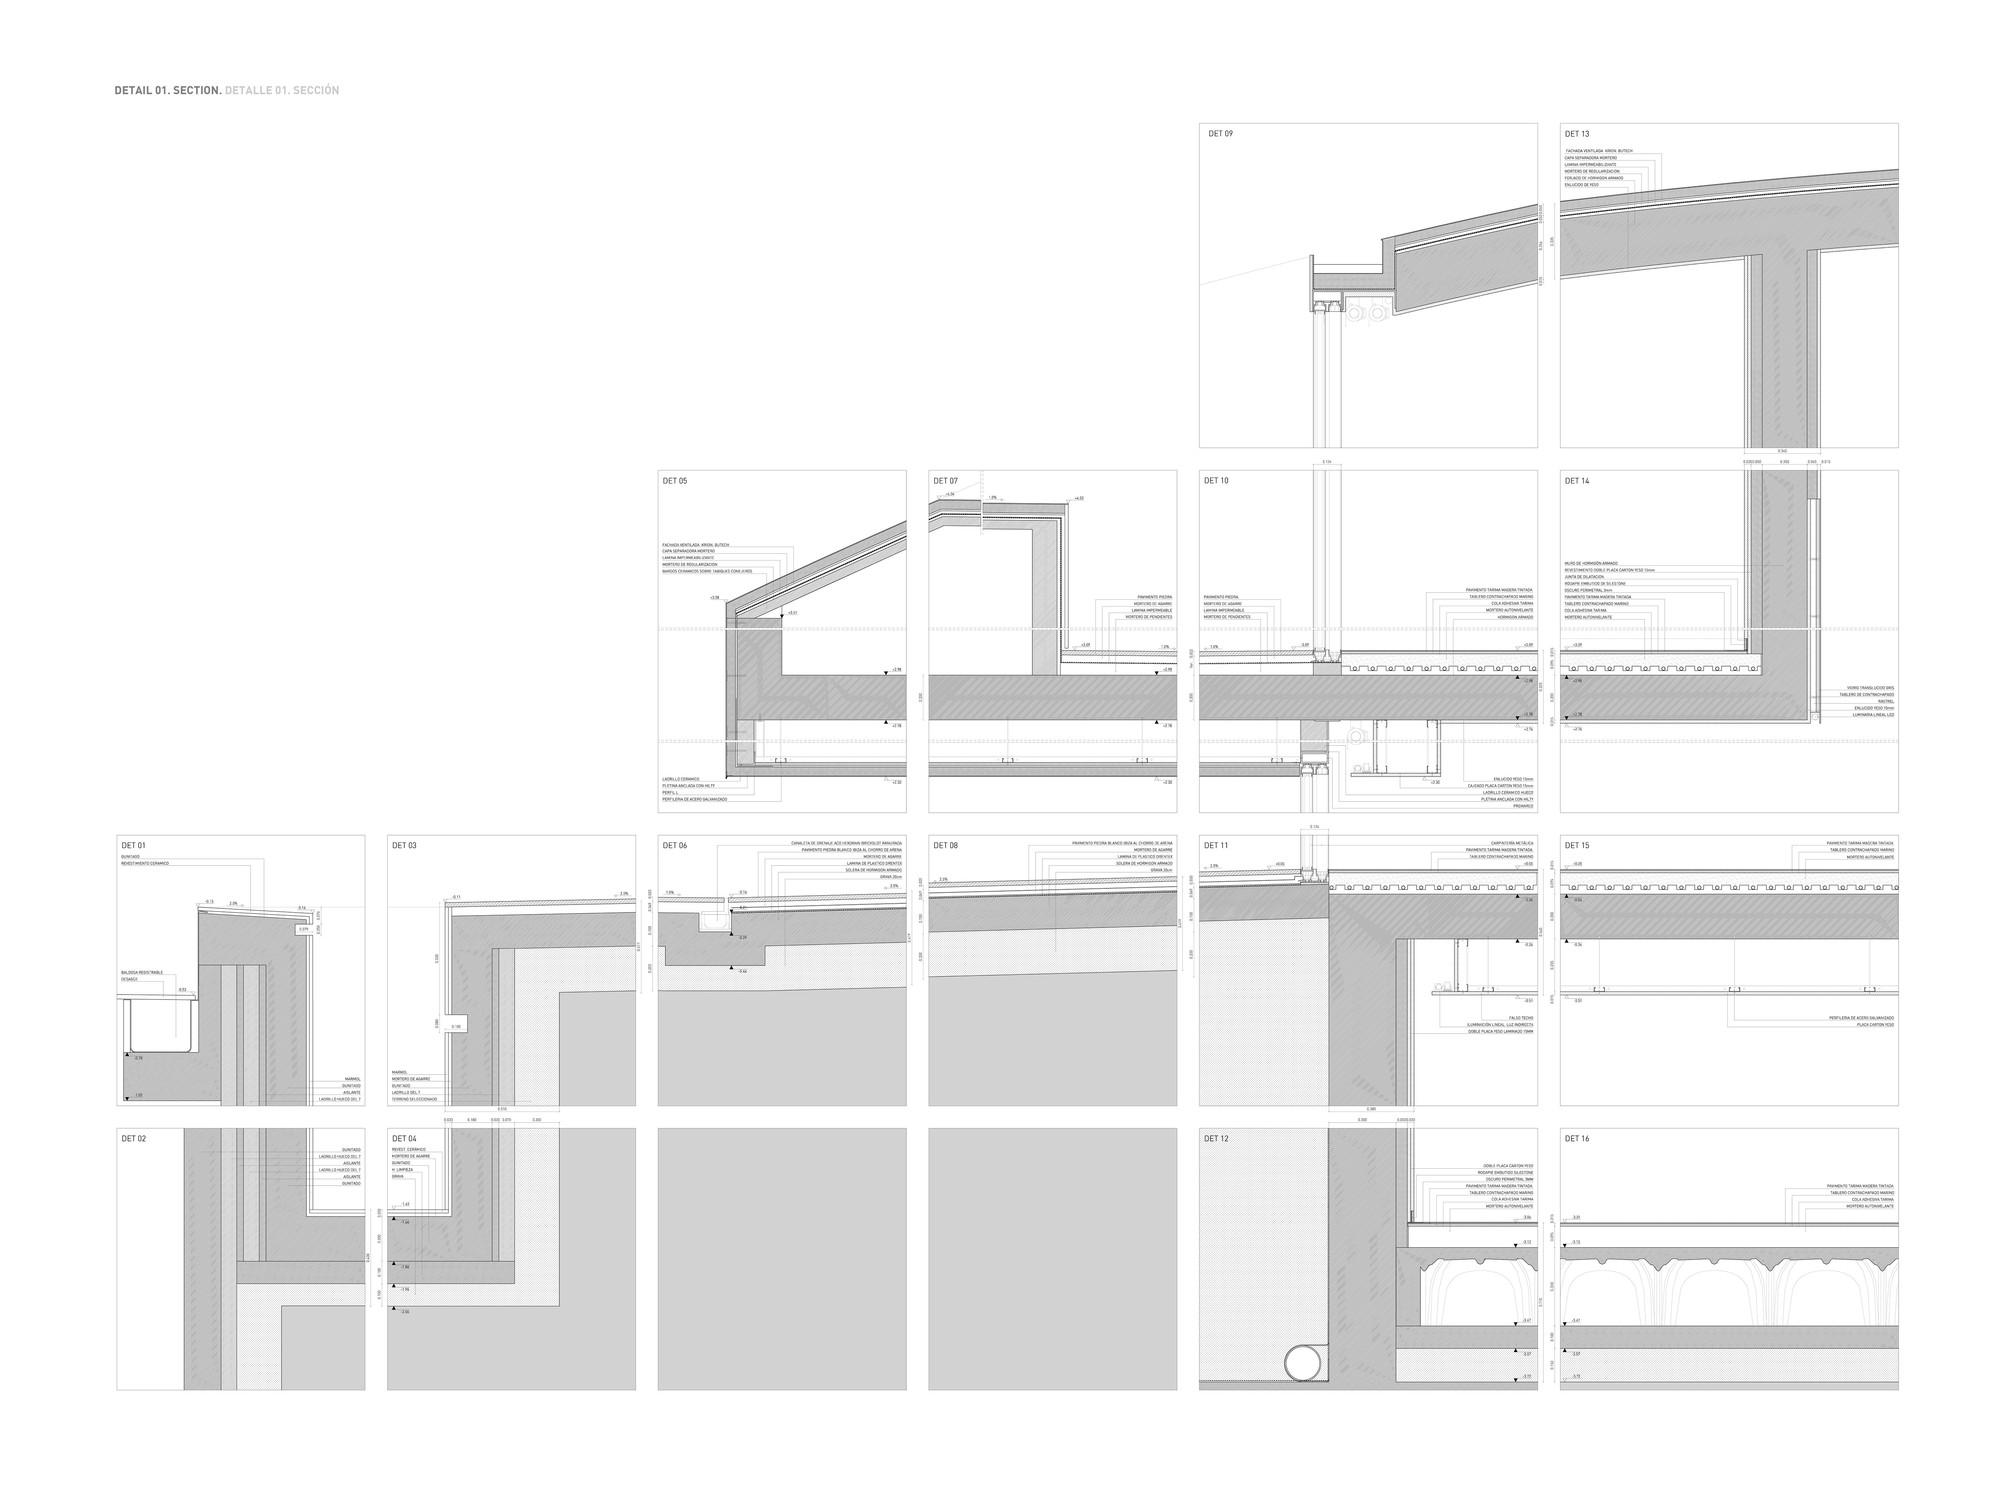 Gallery of balint house fran silvestre arquitectos 29 - Fran silvestre arquitectos ...